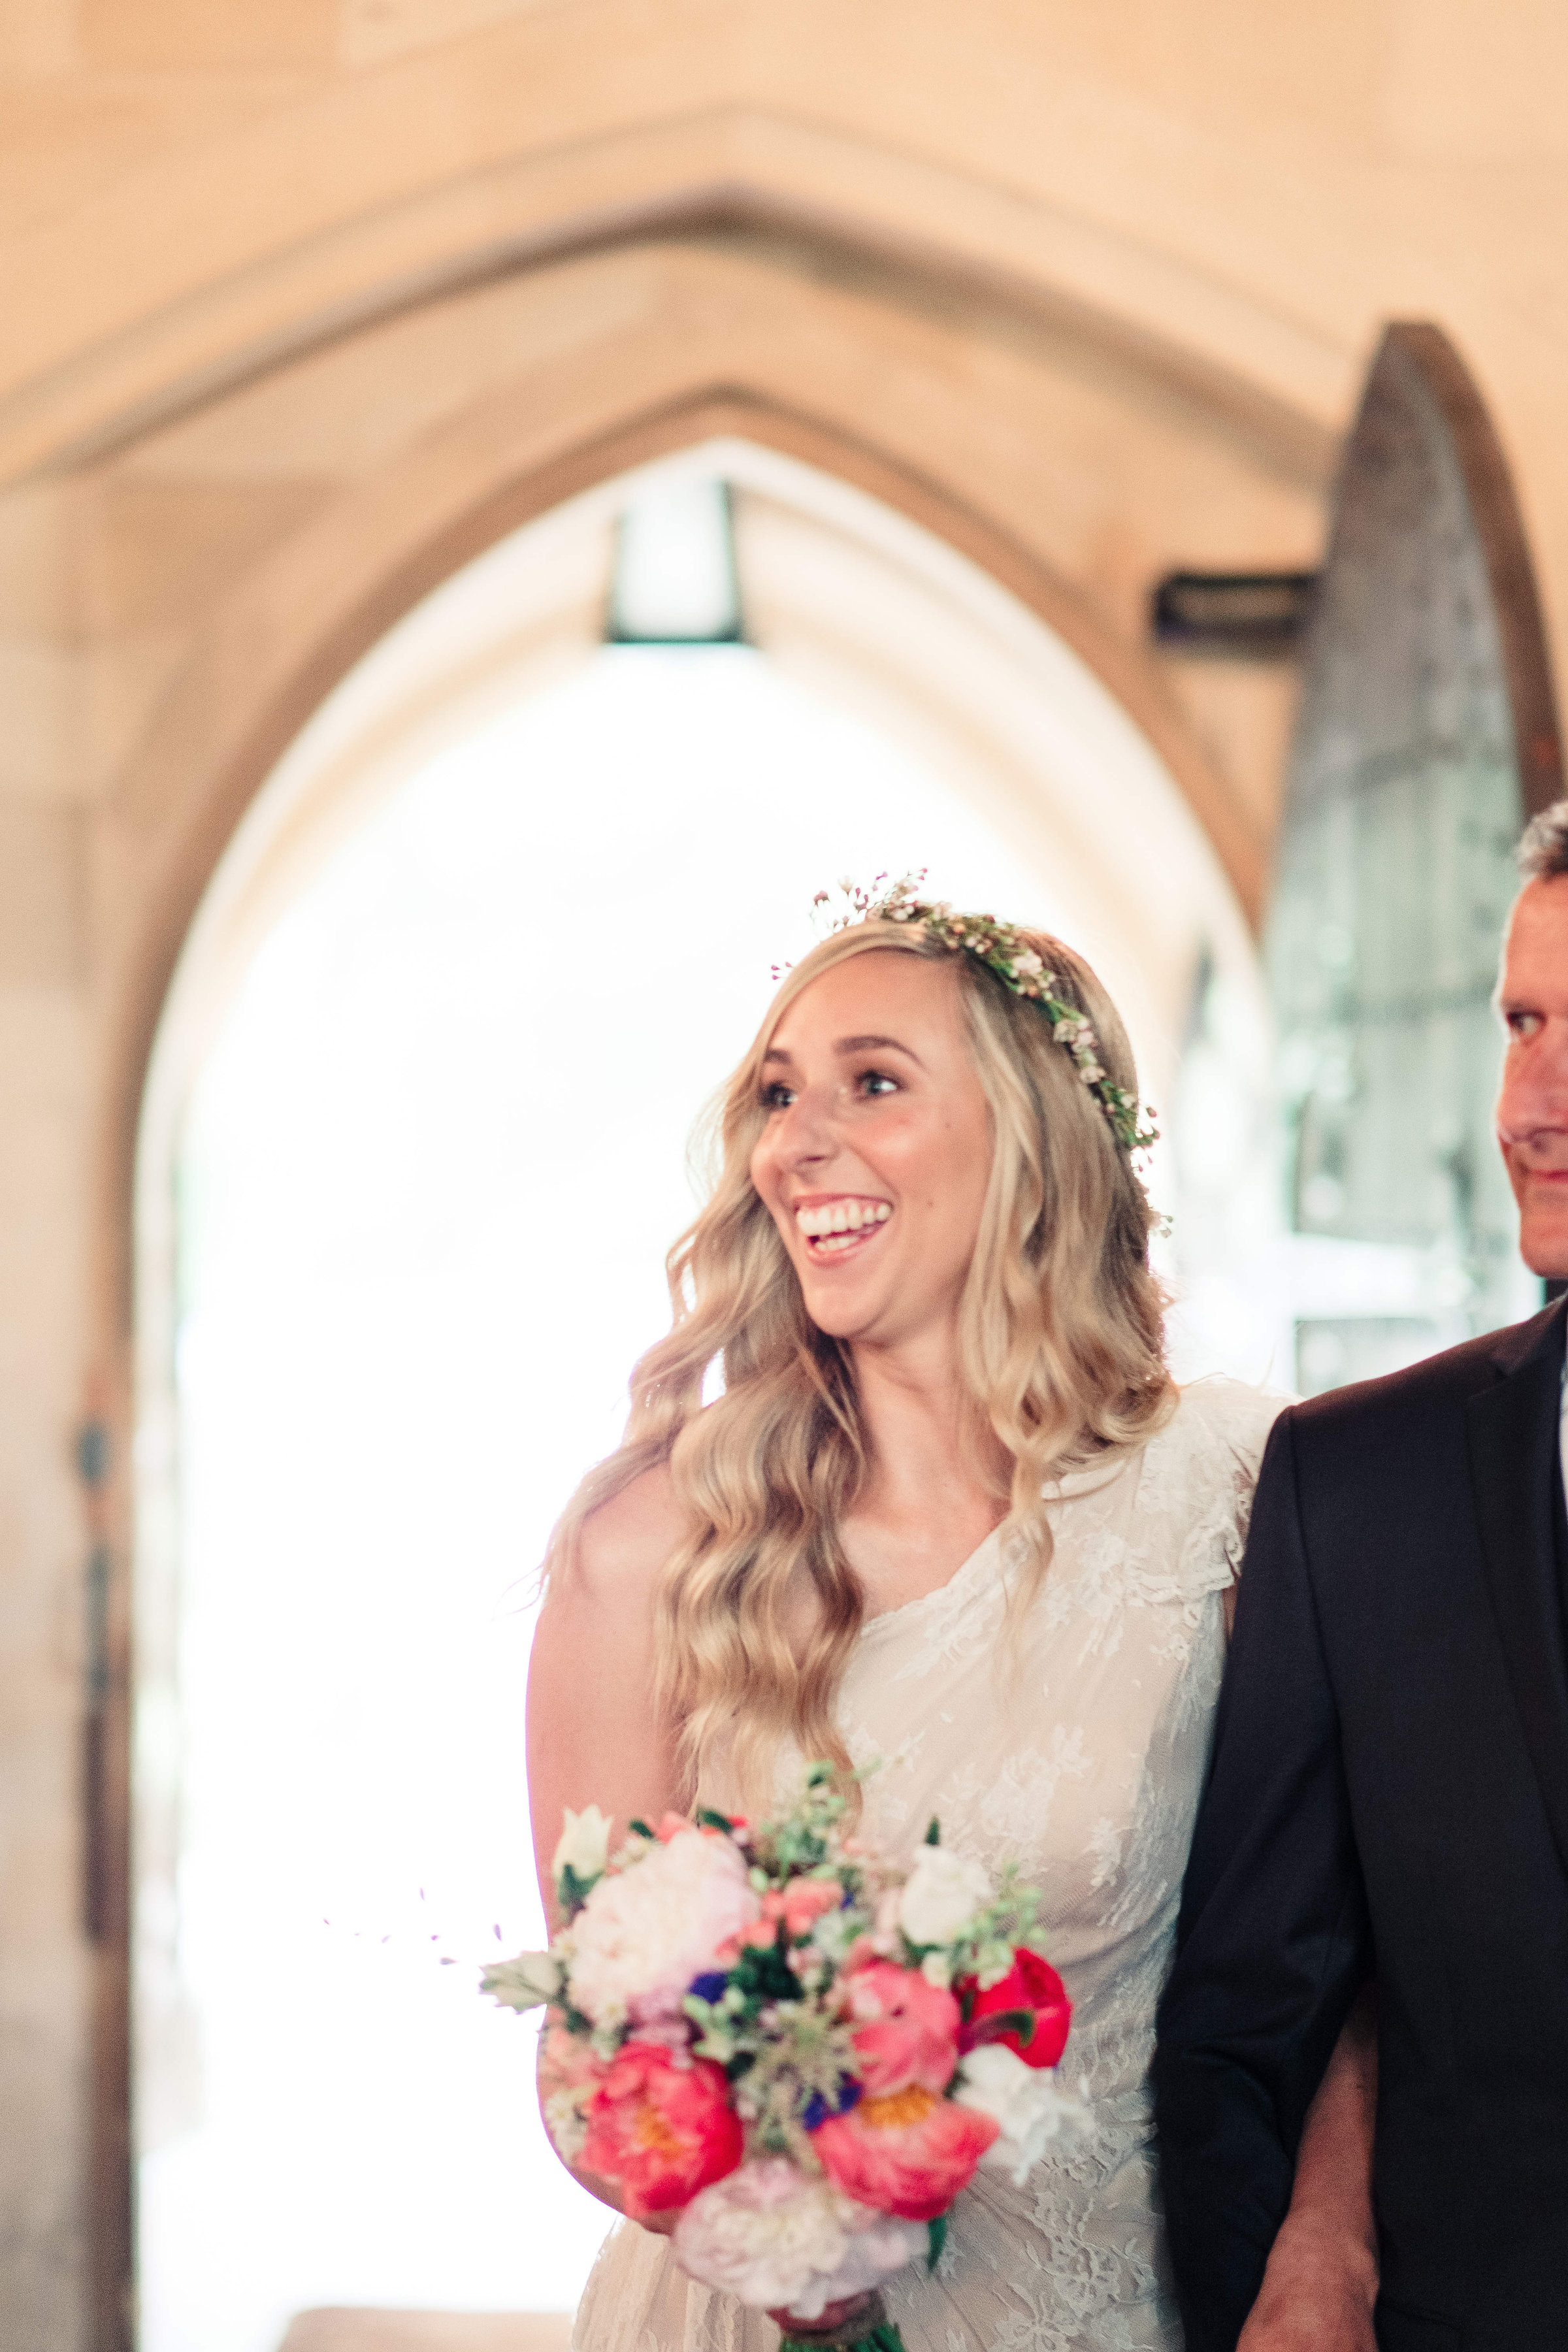 Natural glowing bride